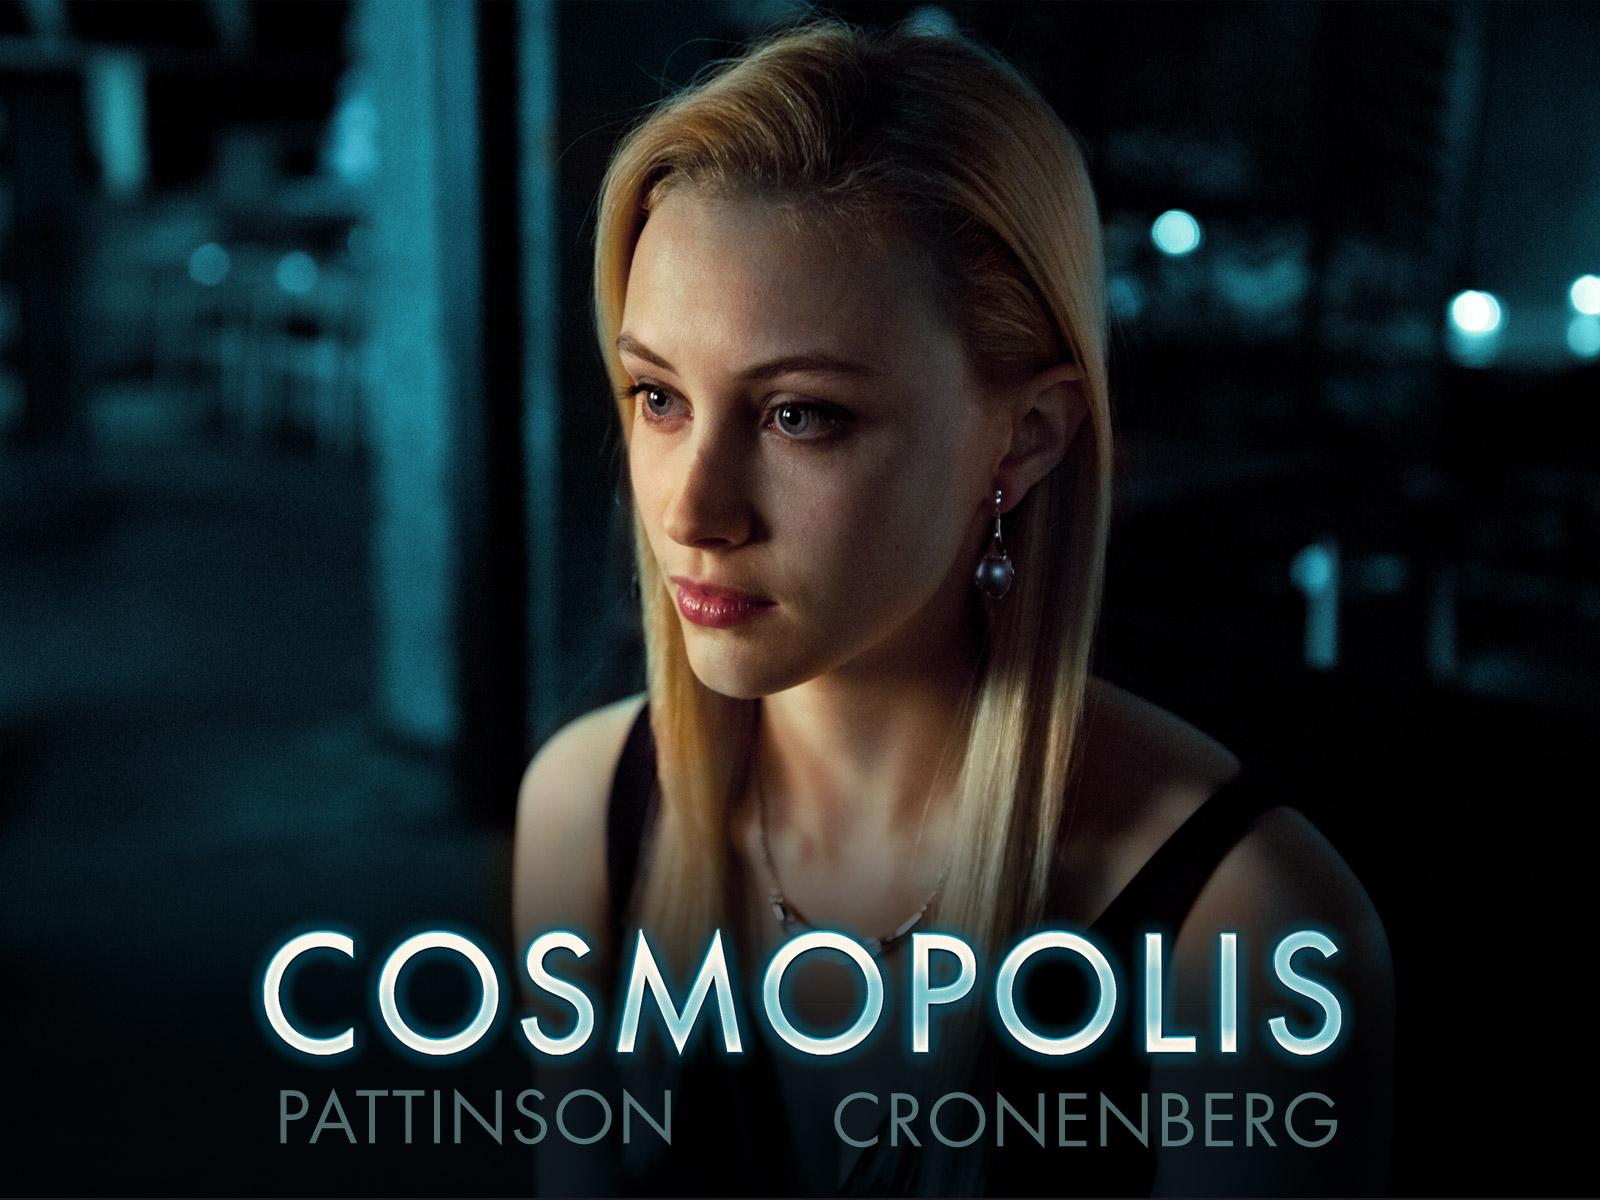 http://3.bp.blogspot.com/-Fy7Ykjuqx6k/UALoXEAyfrI/AAAAAAAACtY/oi7QZWZB1D4/s1600/Cosmopolis+(8).jpg